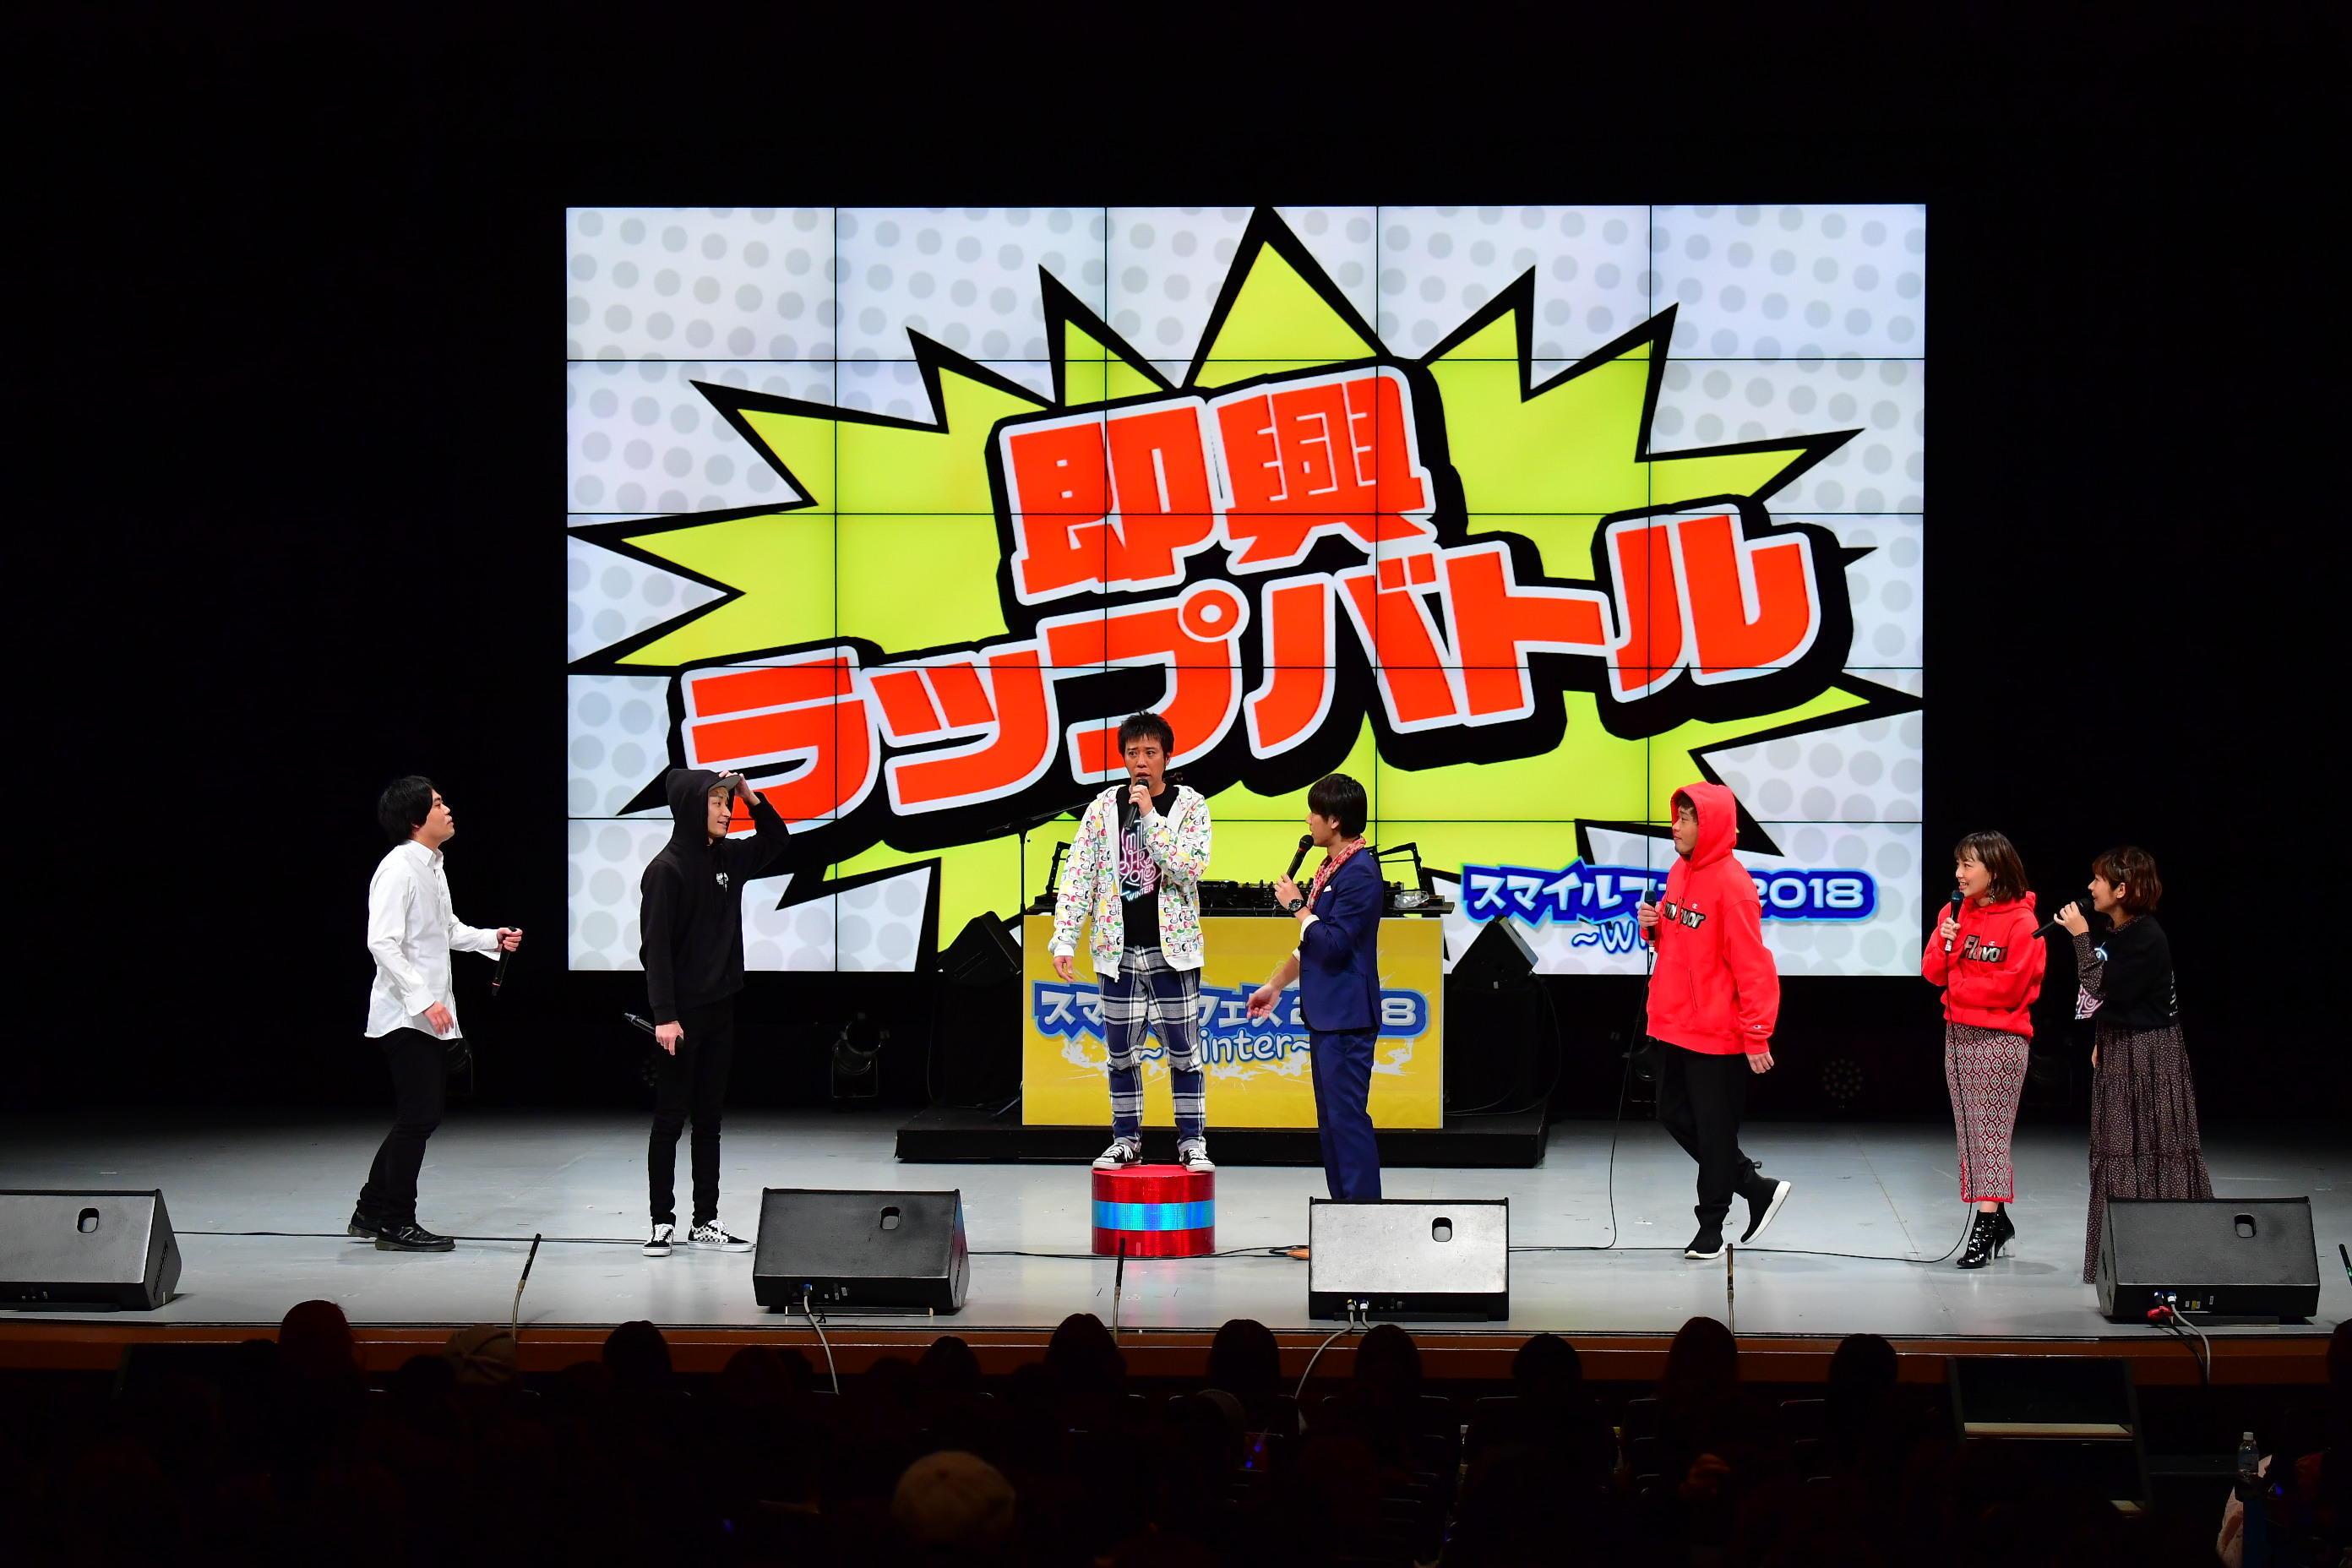 http://news.yoshimoto.co.jp/20180119011412-89e3132f4bd230249b407b830b5a043384d776df.jpg